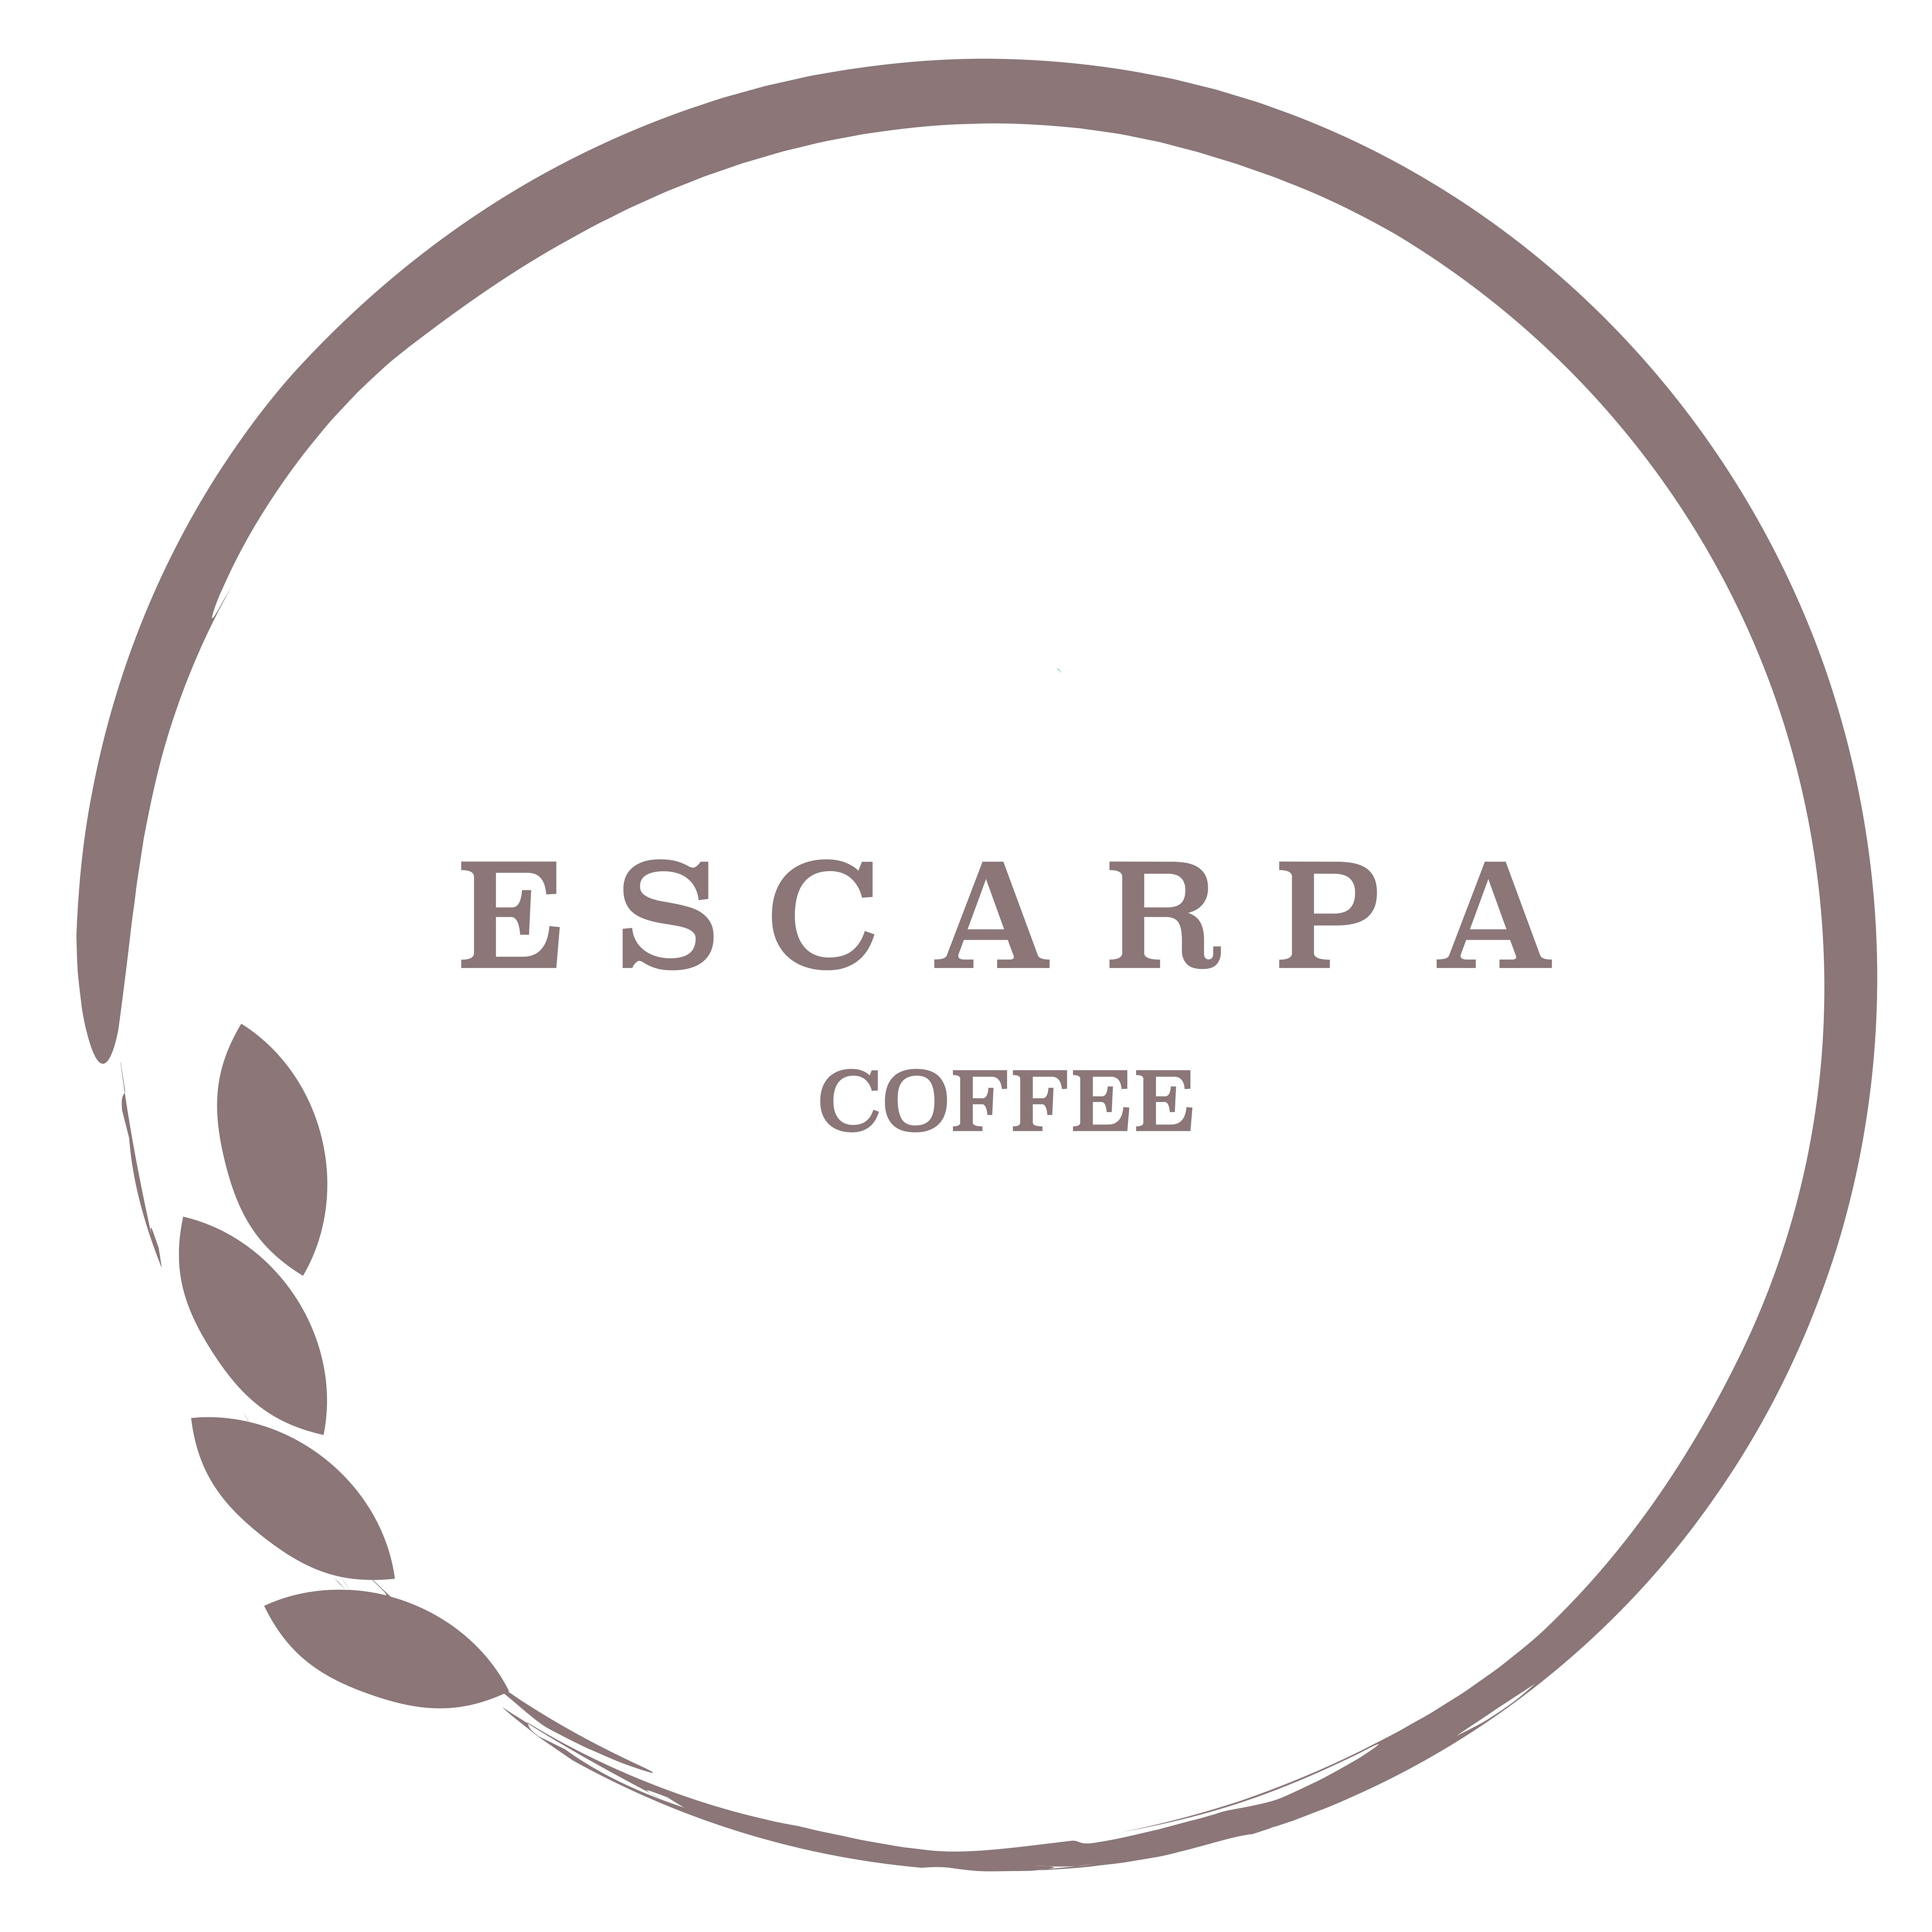 Escarpa Coffee Co.